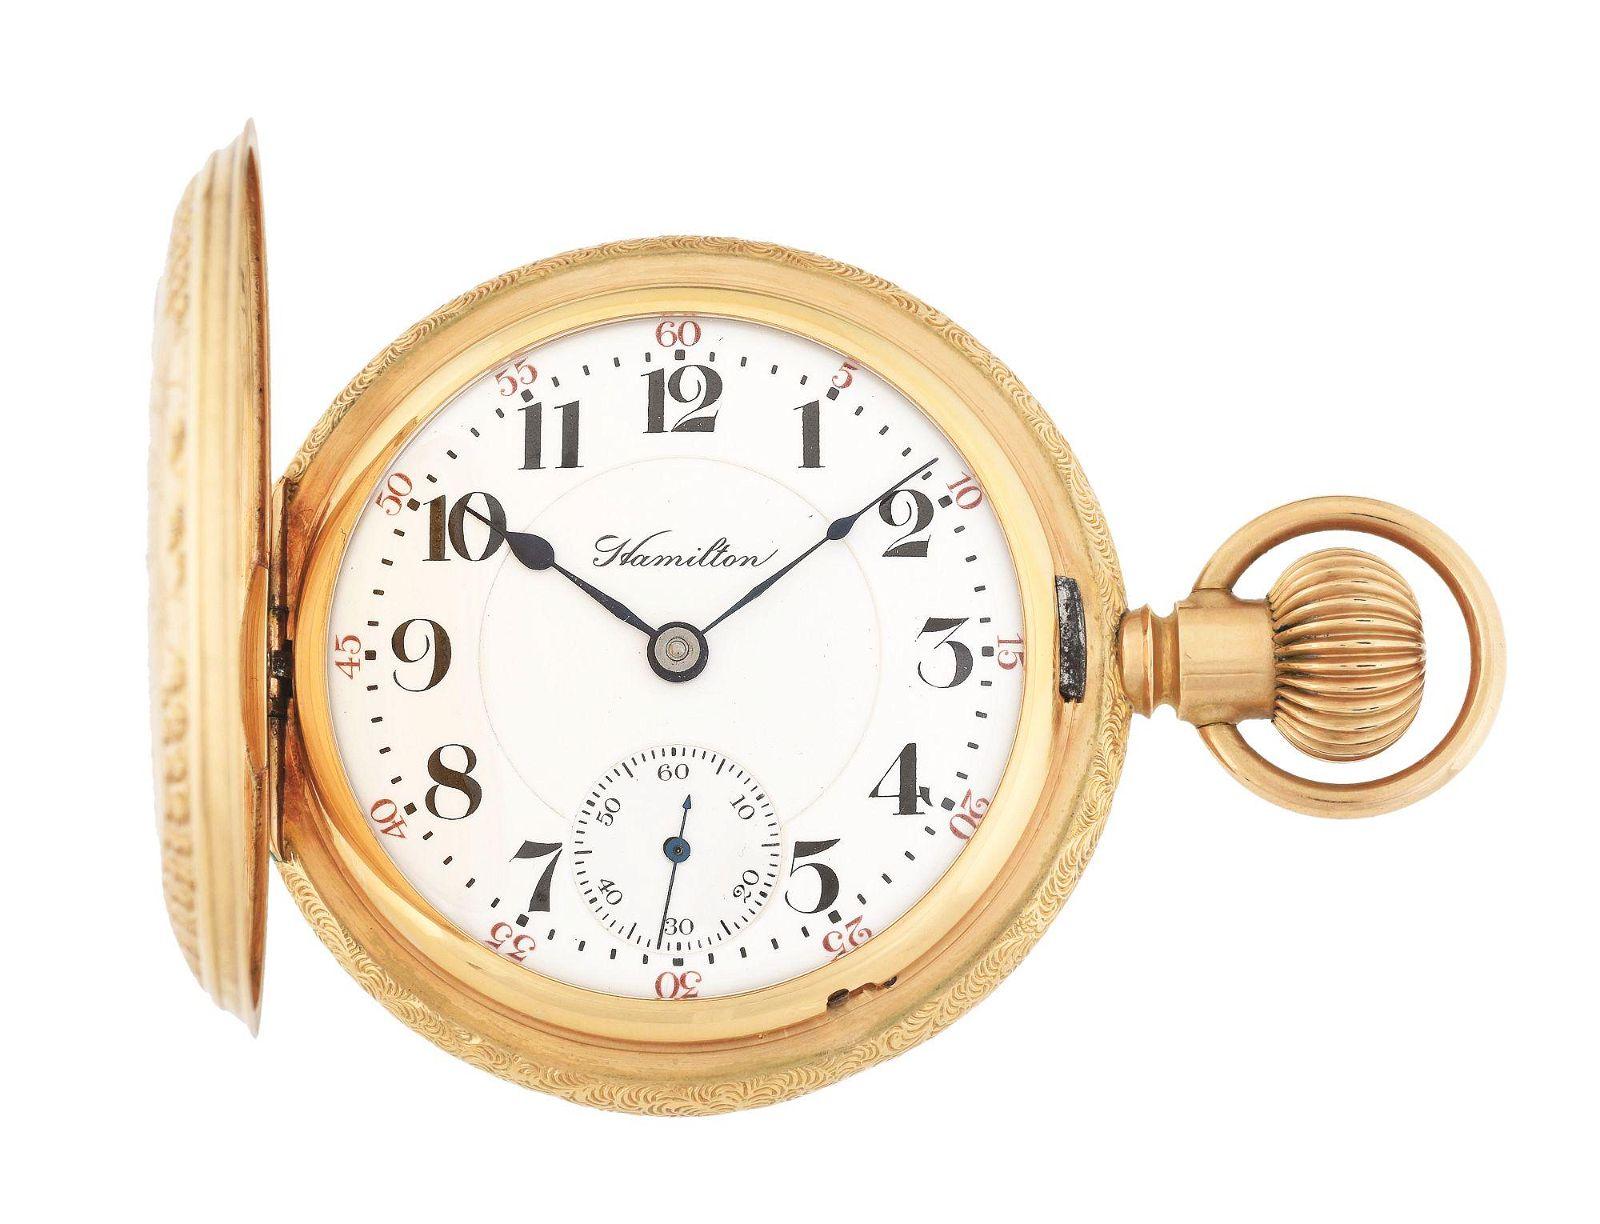 14K GOLD HAMILTON 927 H/C POCKET WATCH CIRCA 1908.